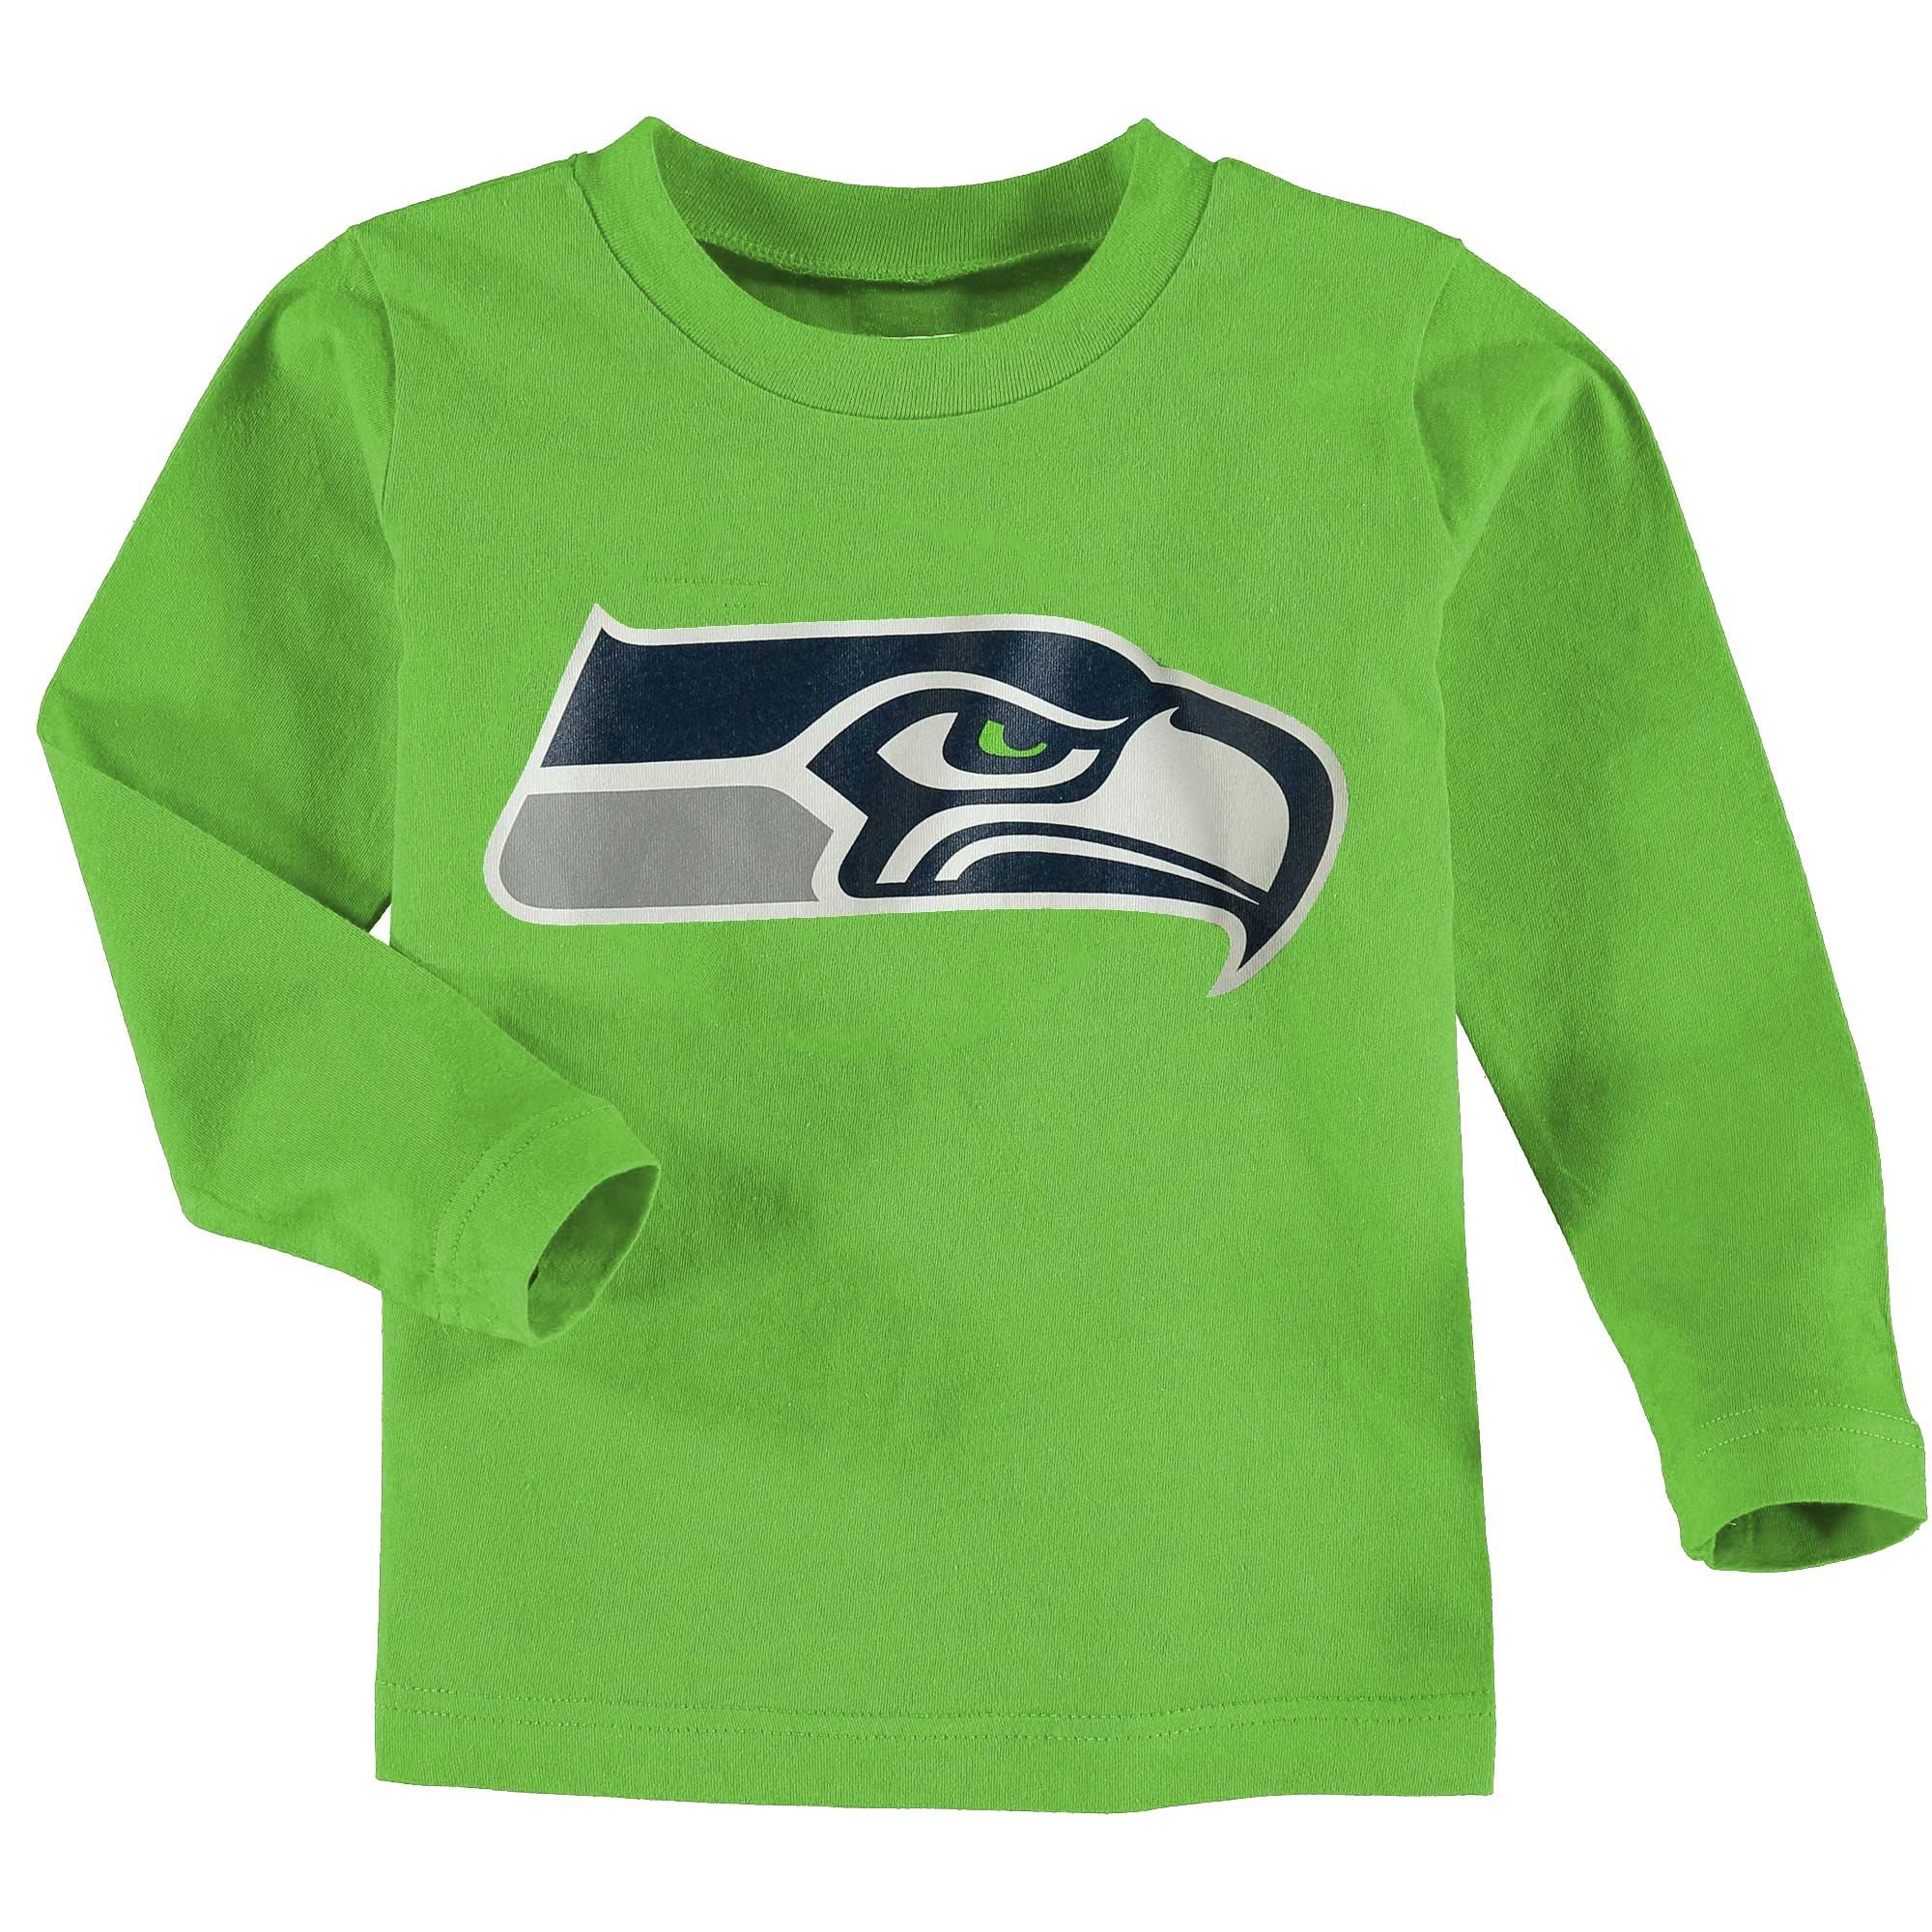 Seattle Seahawks Toddler Team Logo Long Sleeve T-Shirt - Neon Green